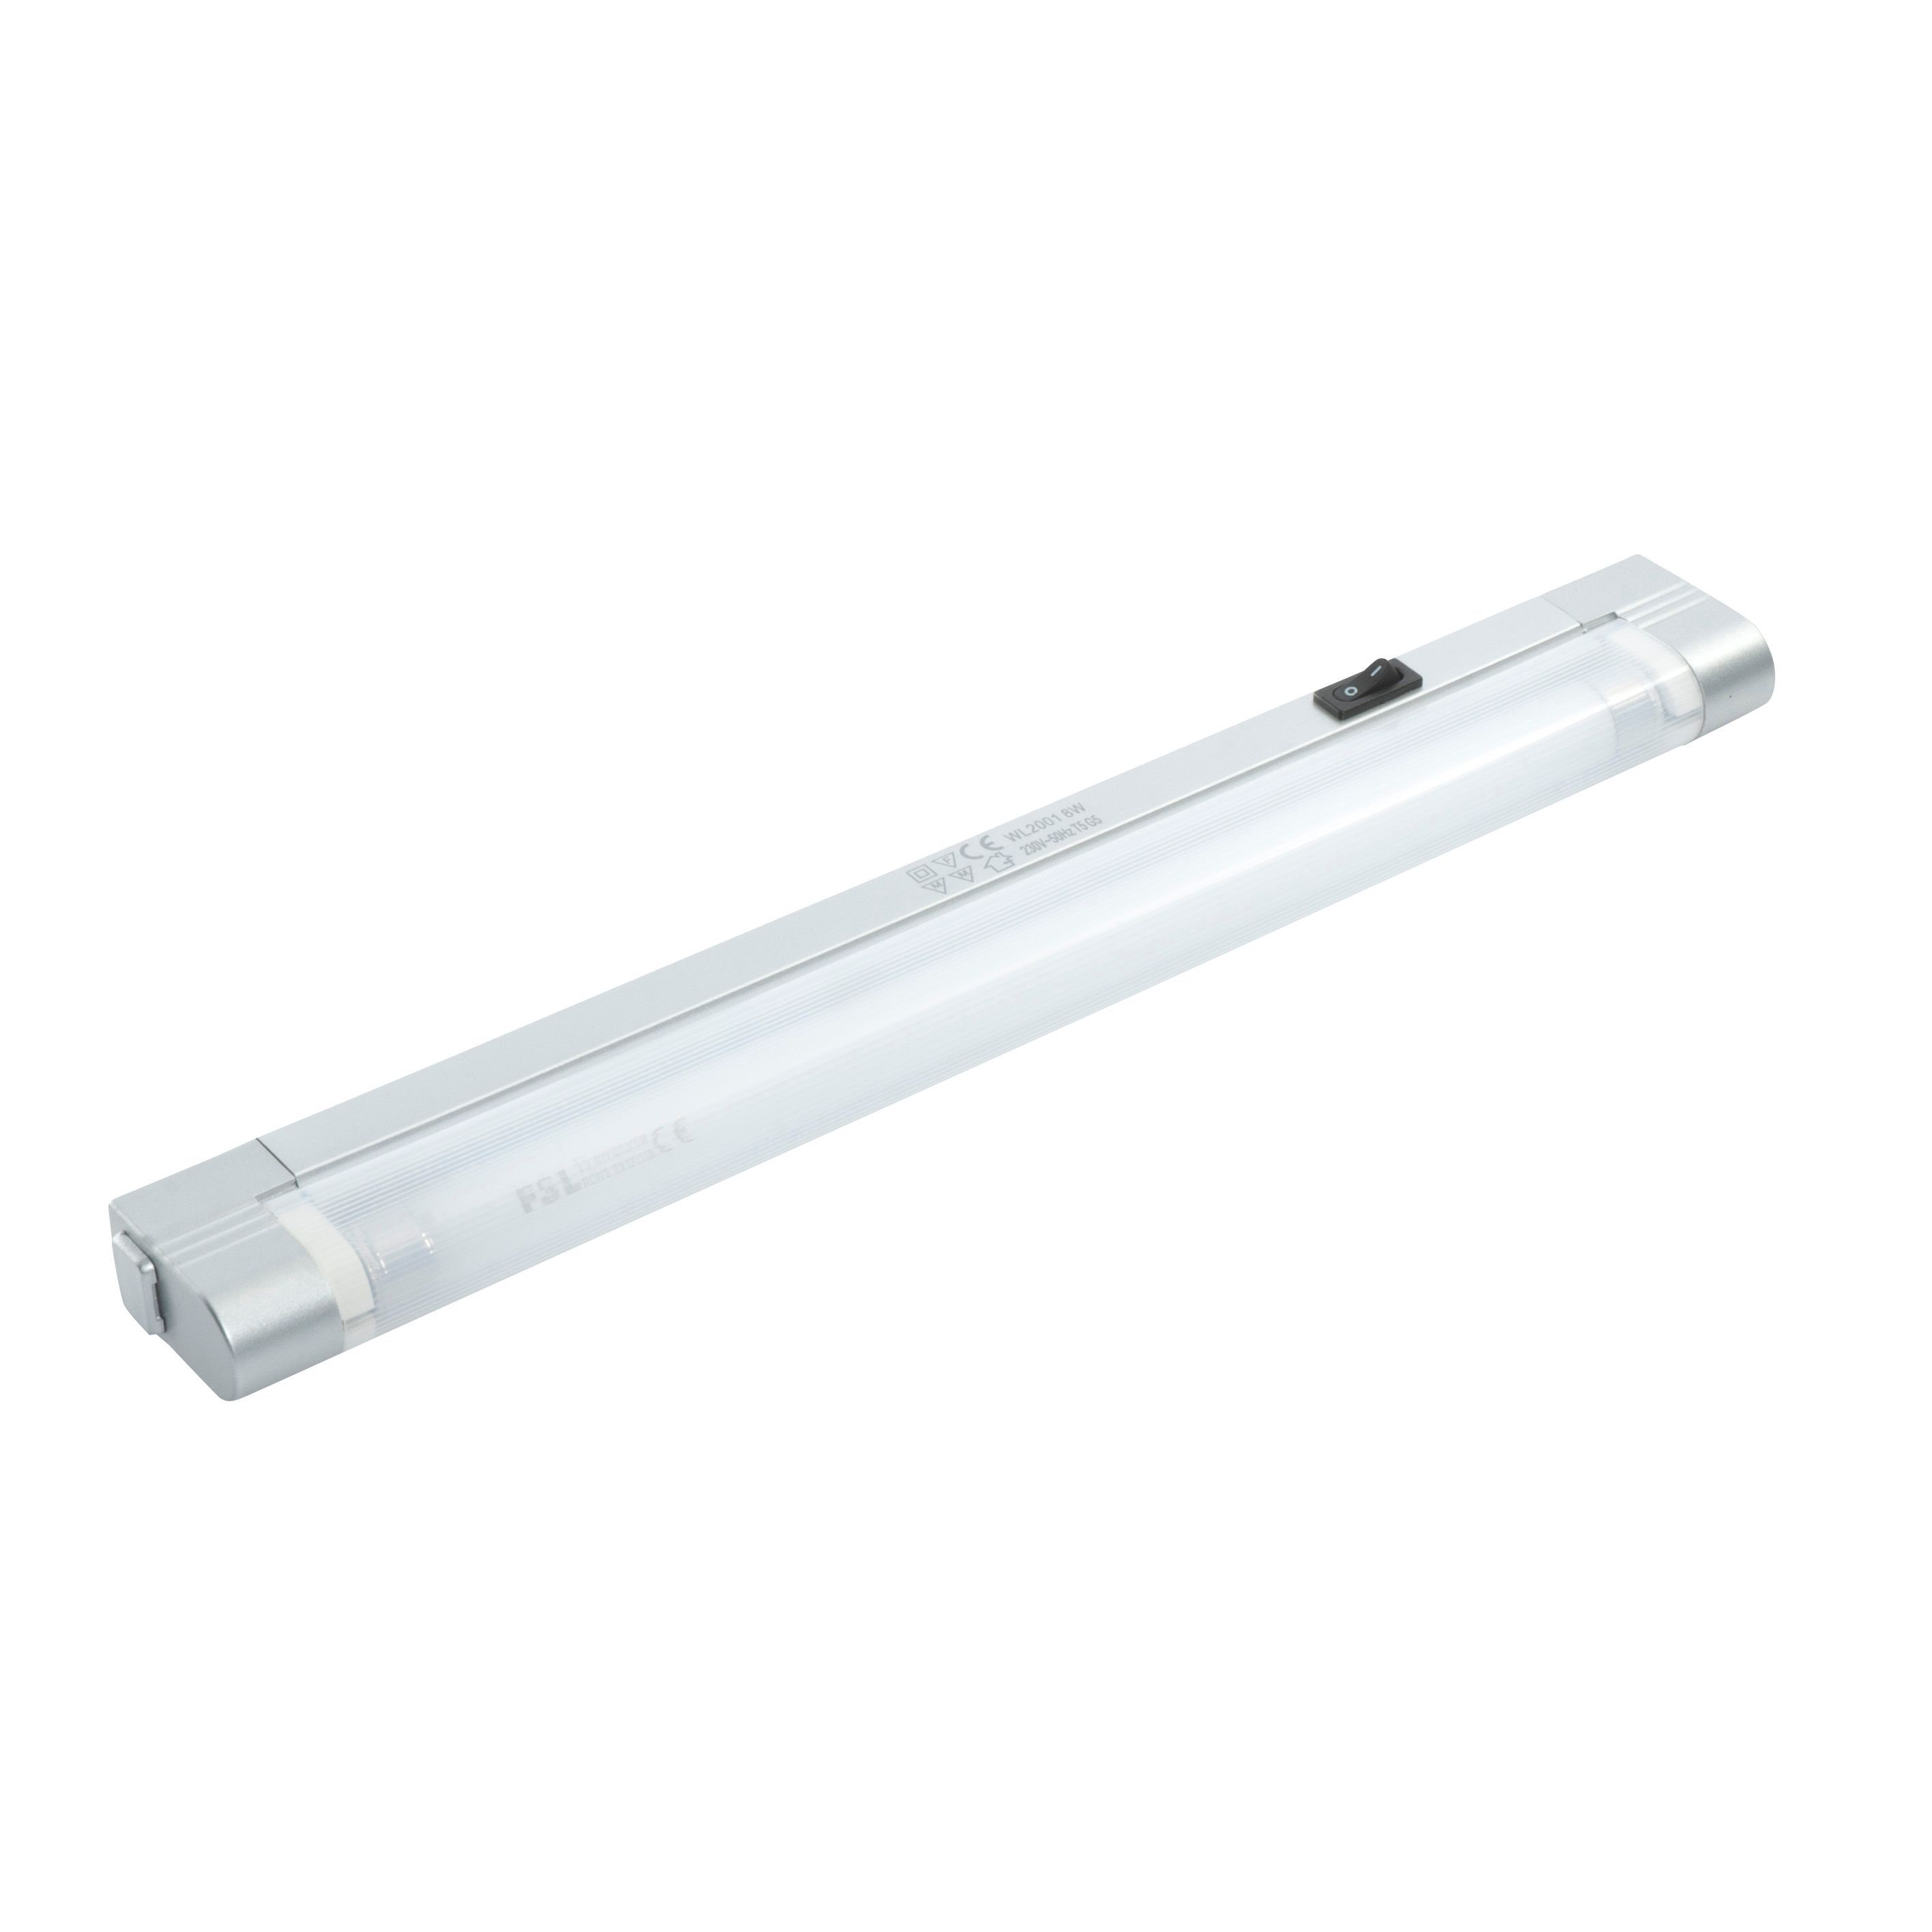 Masterlite Mains Powered Fluorescent Linkable Cabinet Light (l)355mm Ip20